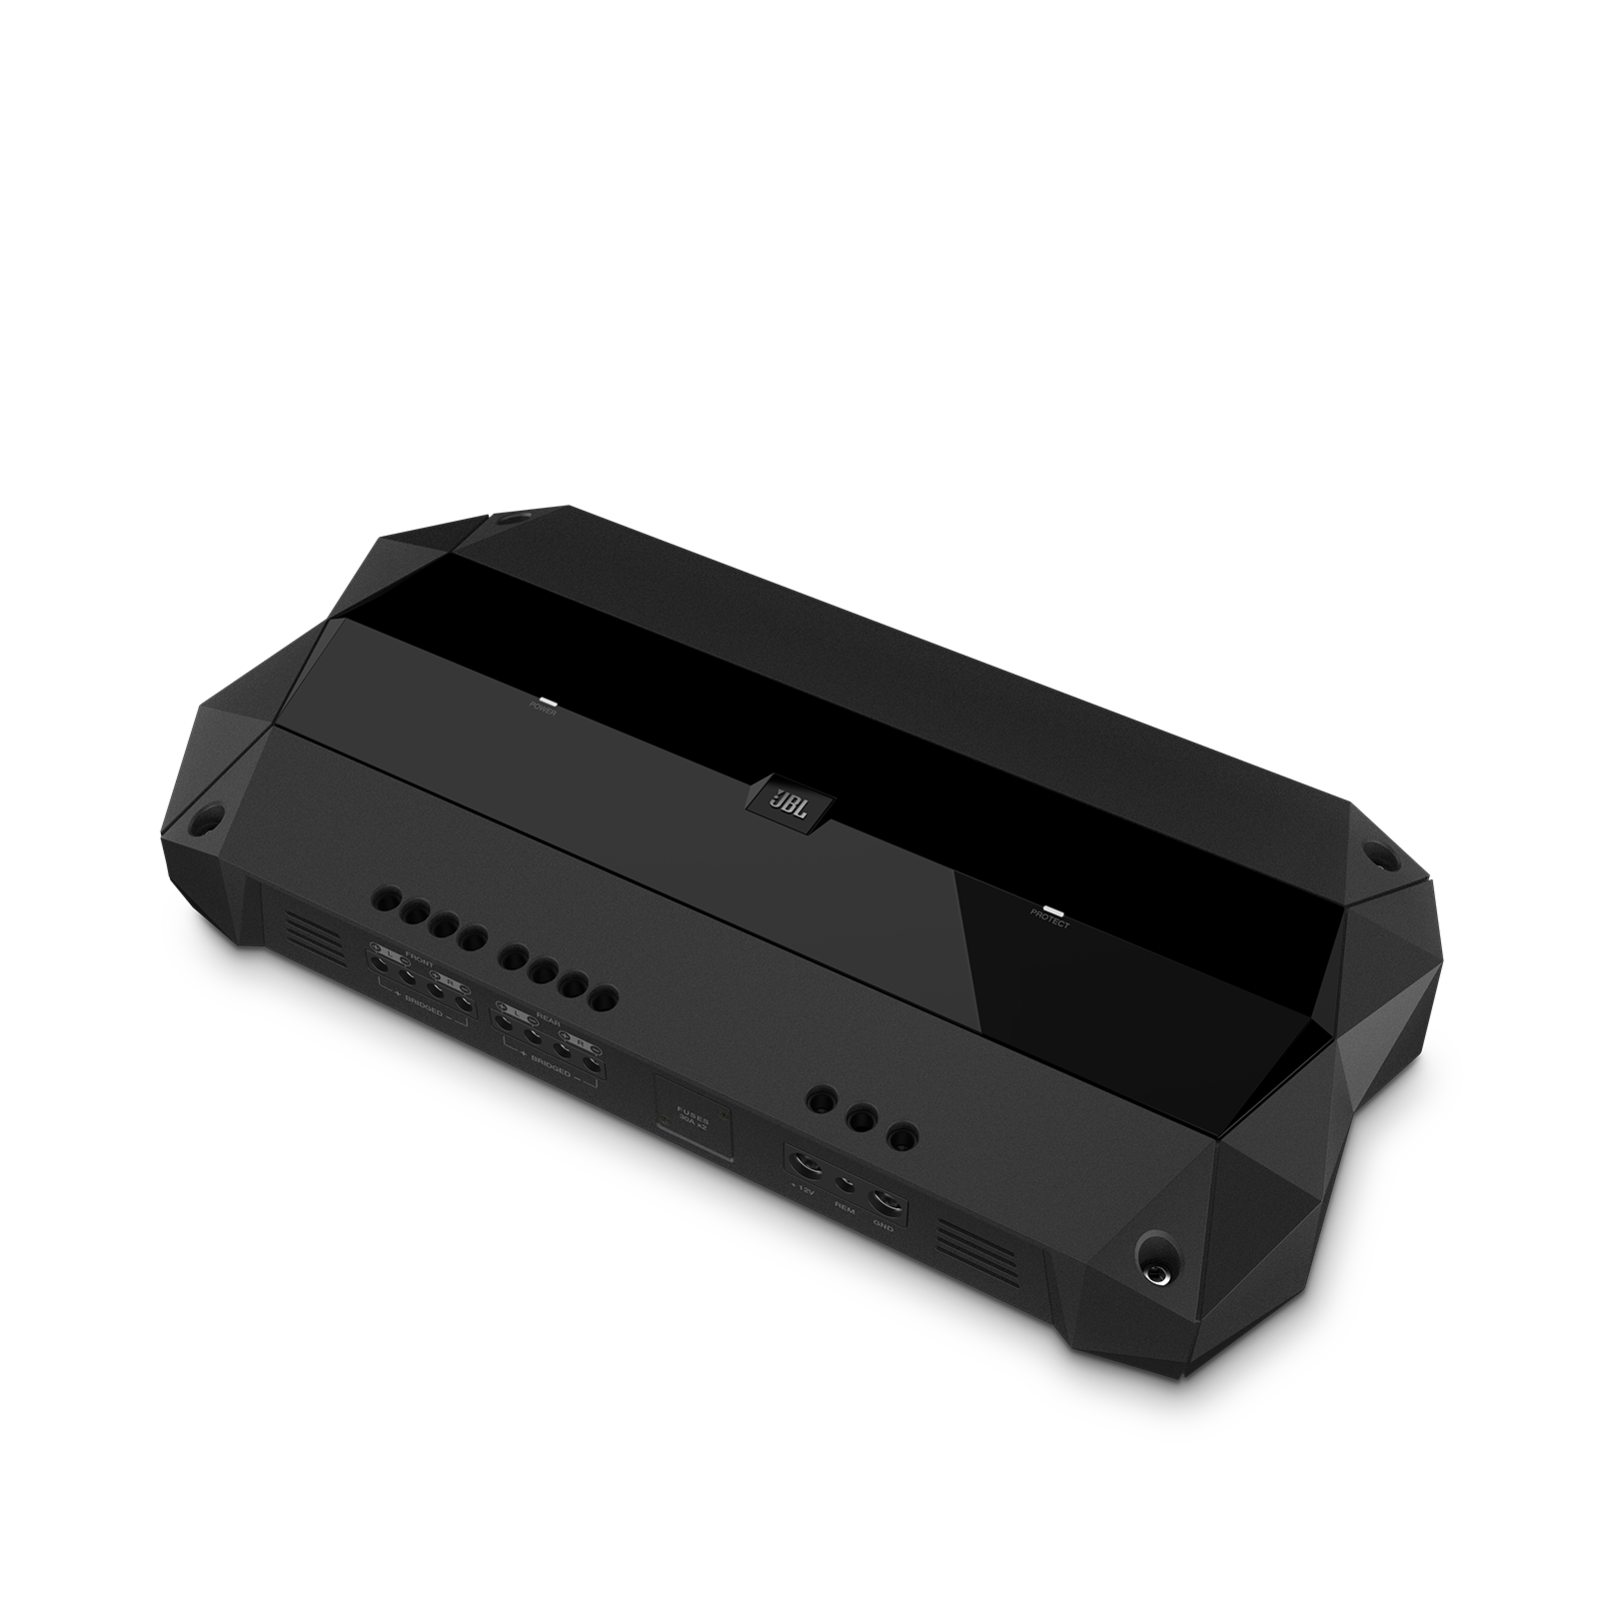 Club 704 - Black - high-performance 4-channel car amplifier - Hero